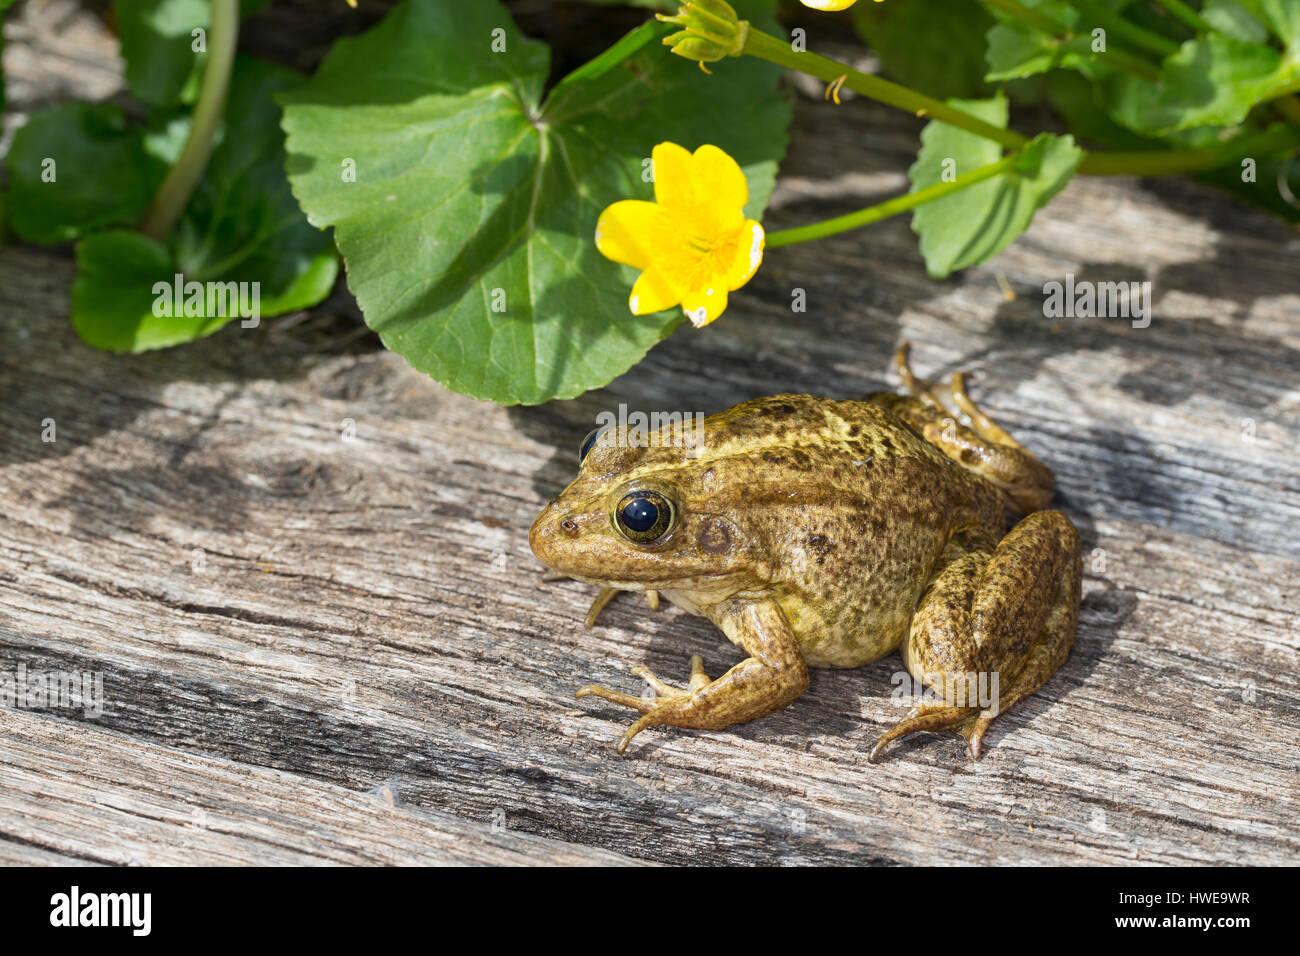 Teichfrosch, Teich-Frosch, Grünfrosch, Wasserfrosch, Grün-Frosch, Wasser-Frosch, Frosch, Frösche, - Stock Image